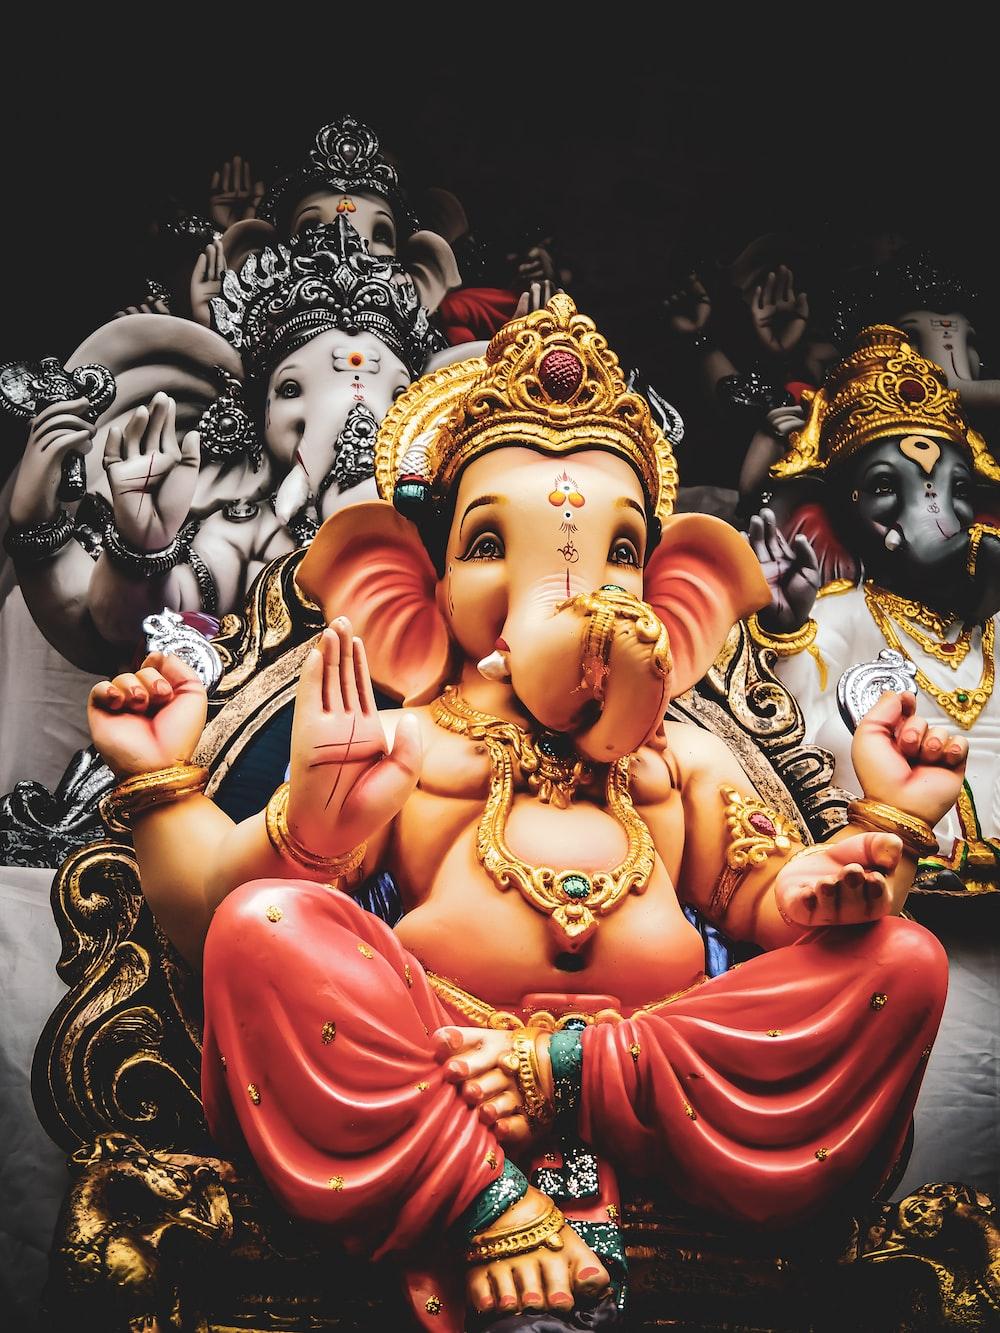 three Lord Ganesha statuettes